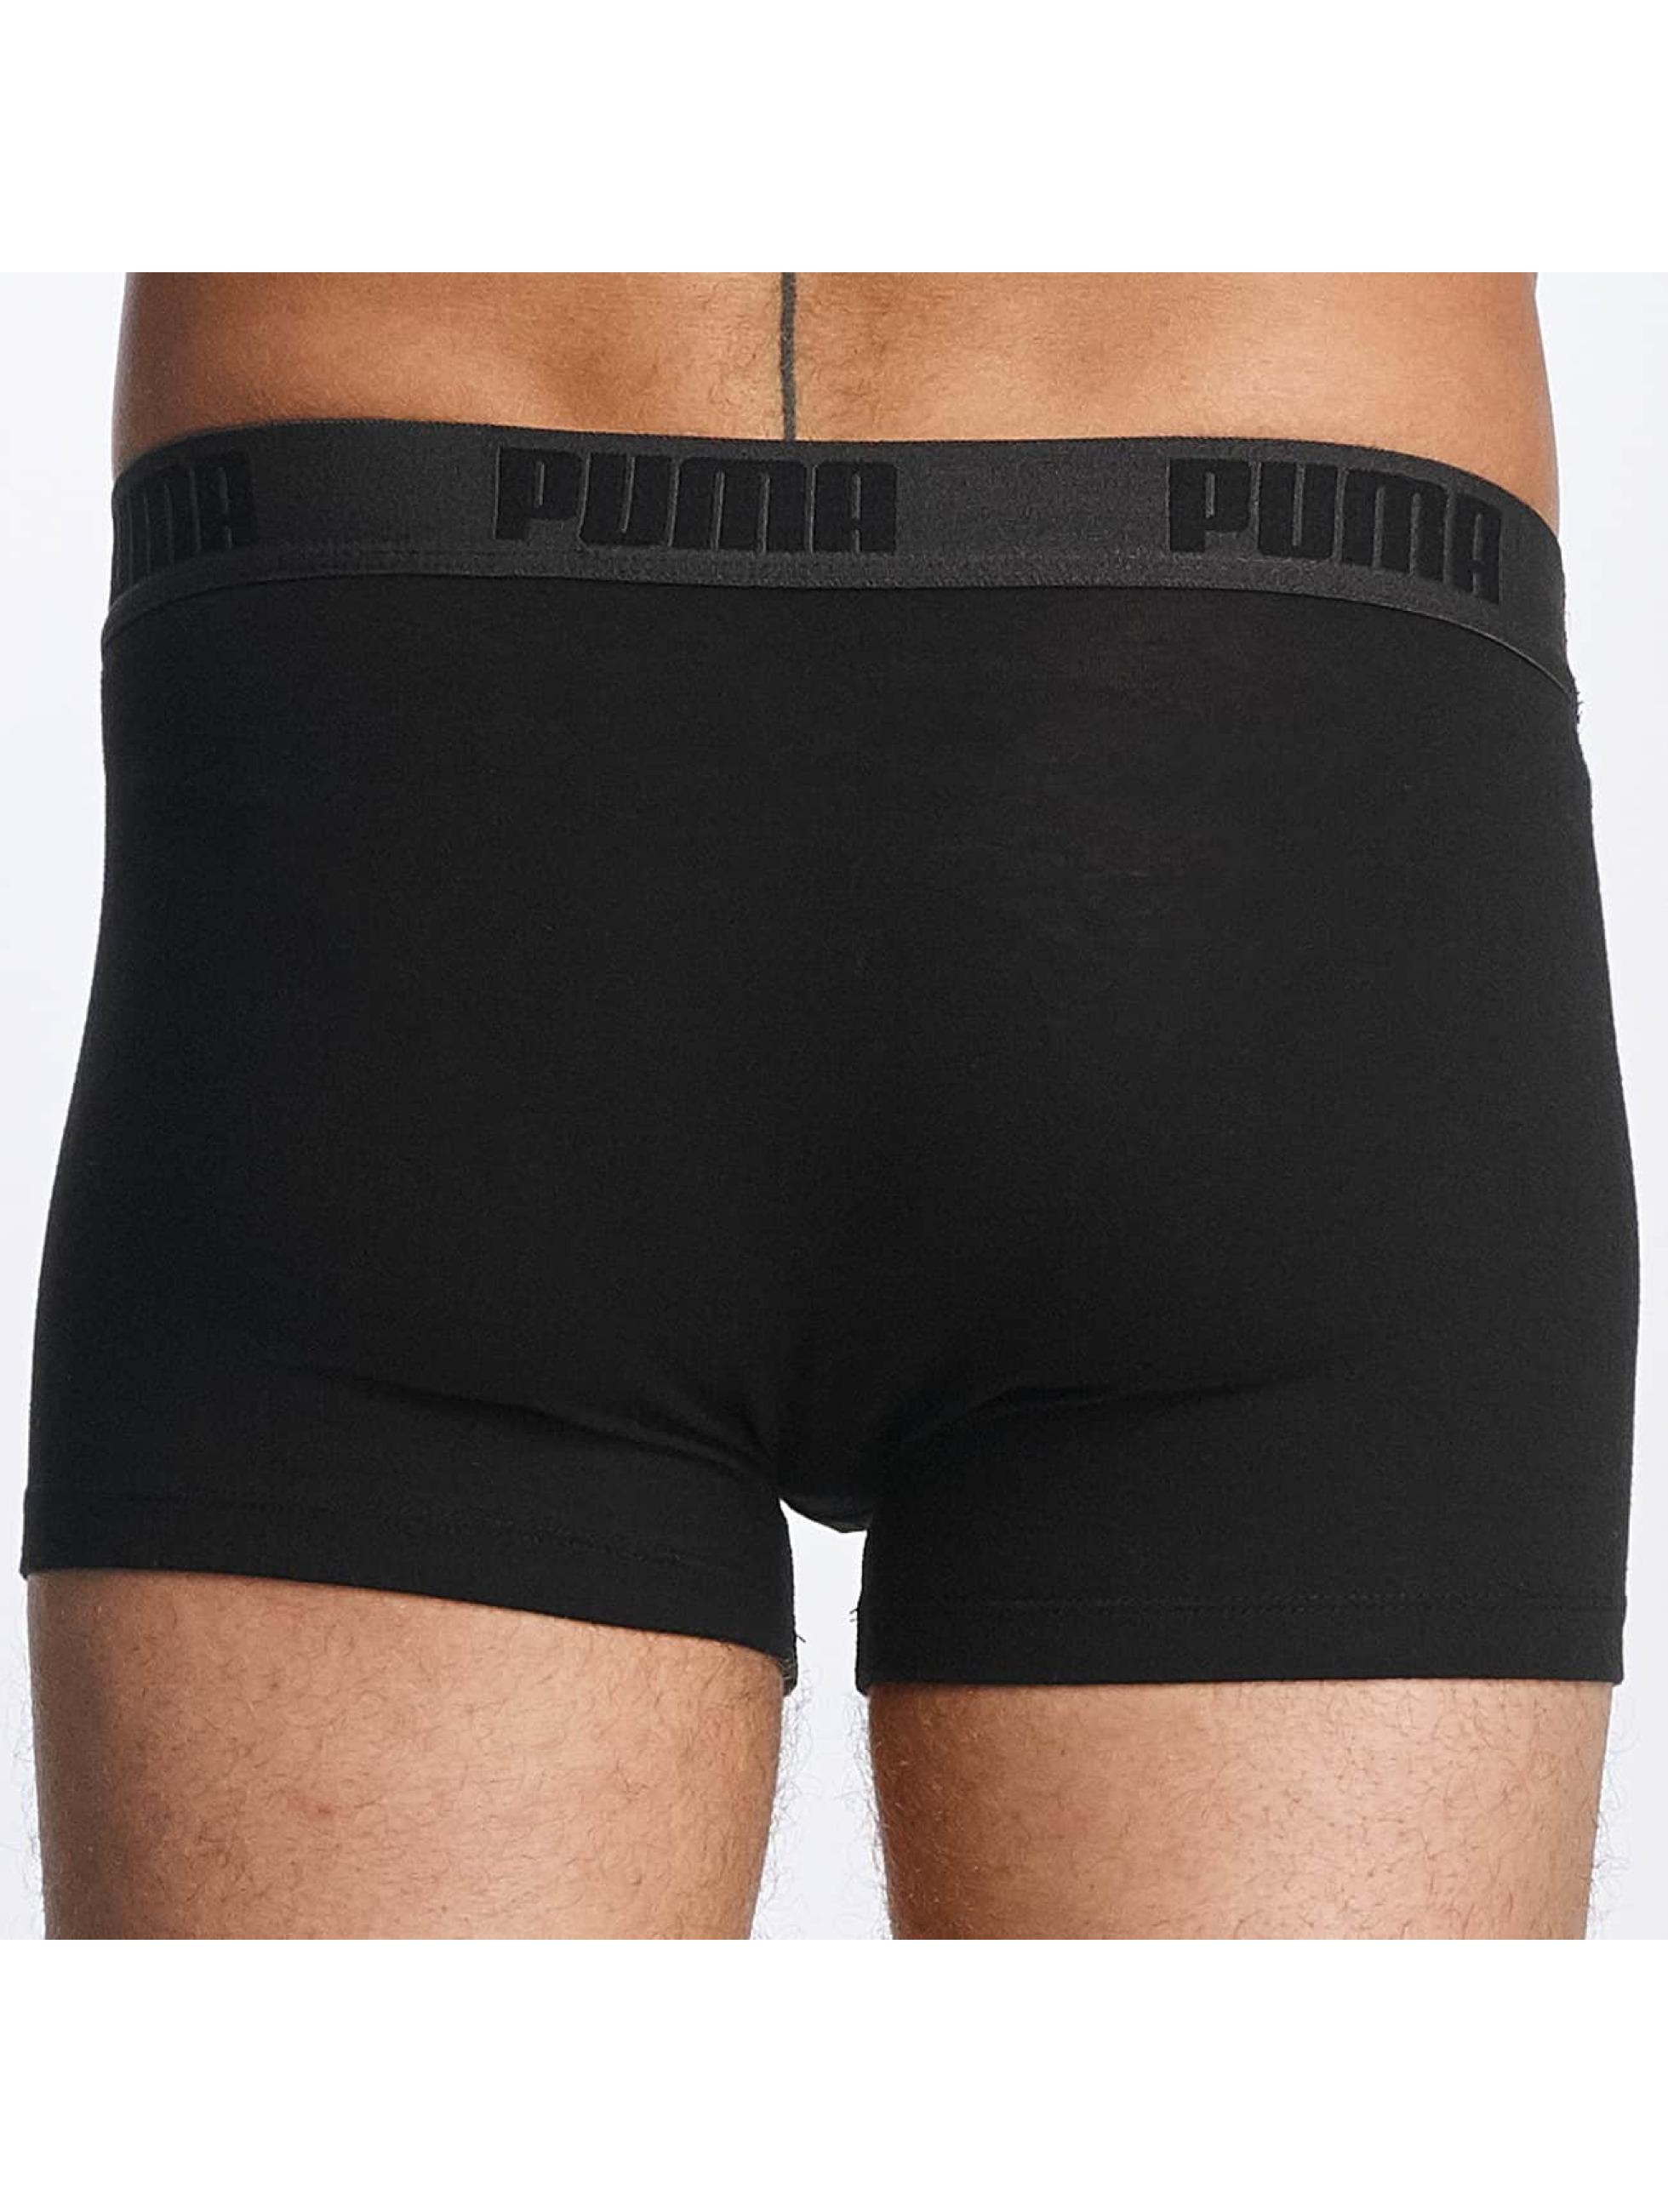 Puma Boxer 2-Pack Basic Trunk noir